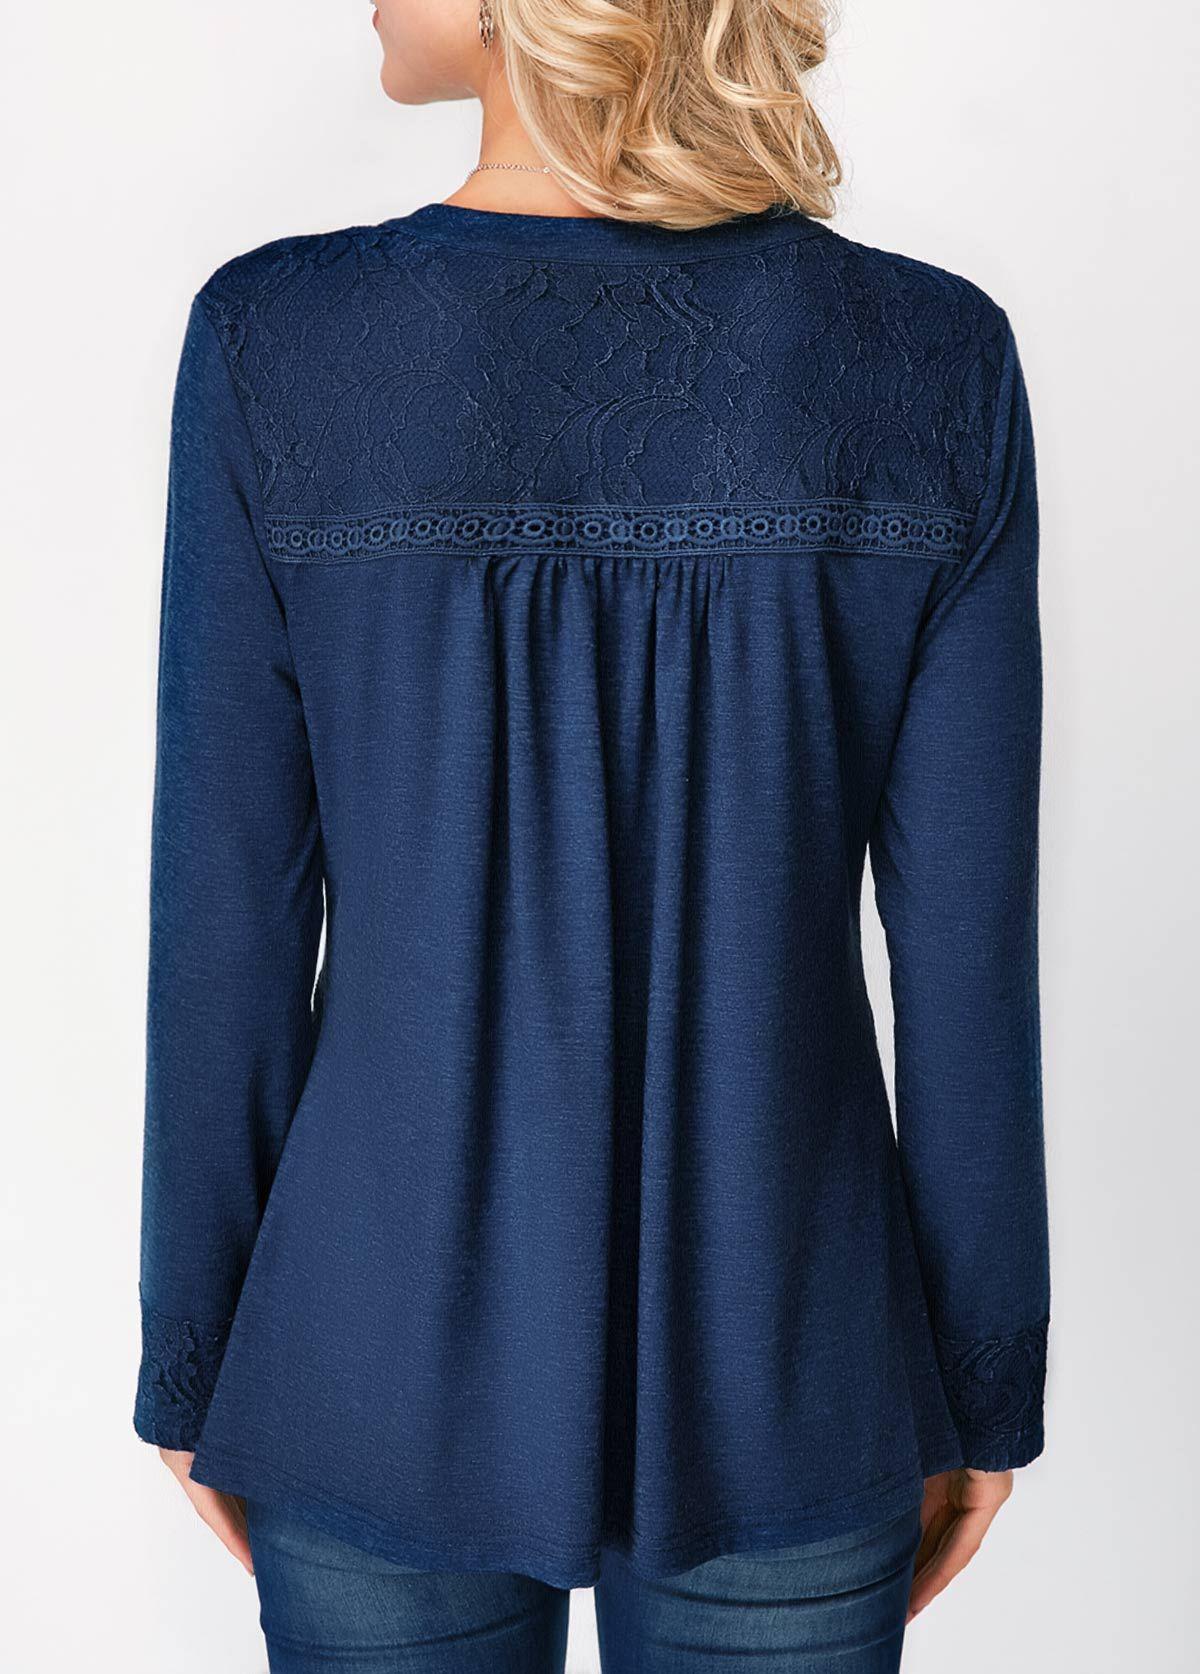 90f47e87b83f76 Button Up Long Sleeve Lace Panel Blouse | Rotita.com - USD $32.19 ...